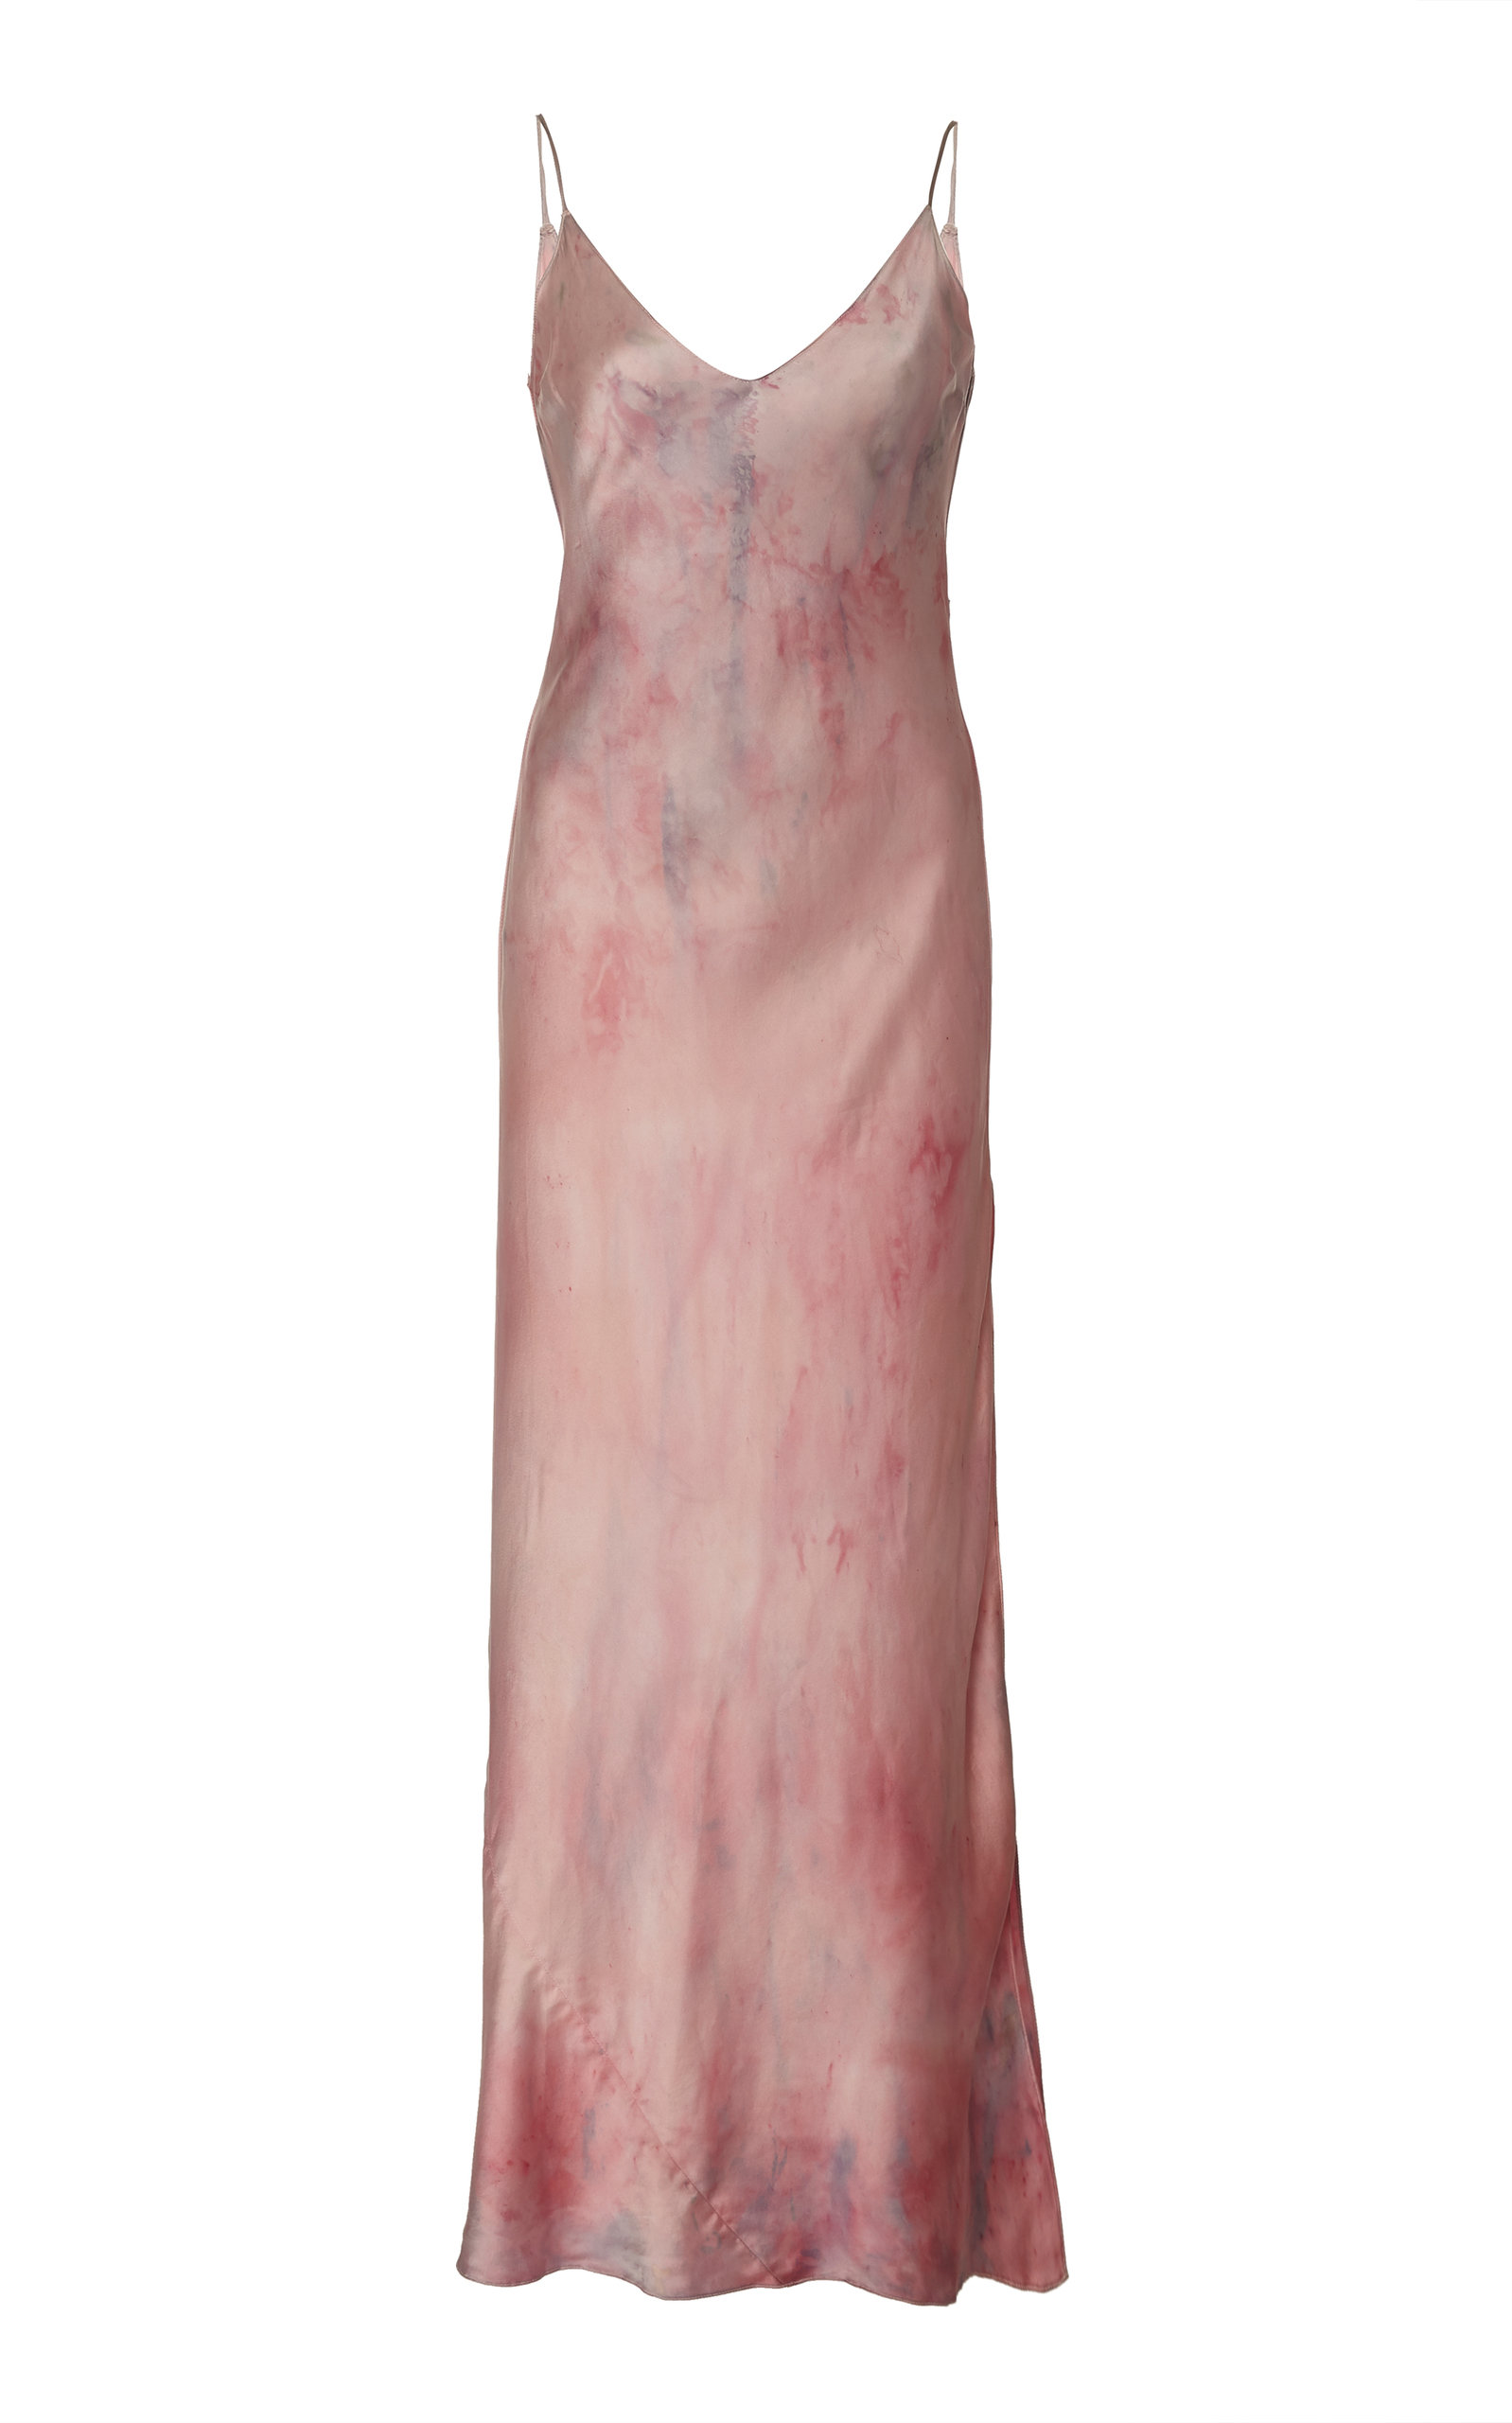 8e3899a1853b Mossy Silk Natural Dyed Slip Dress by Dannijo   Moda Operandi